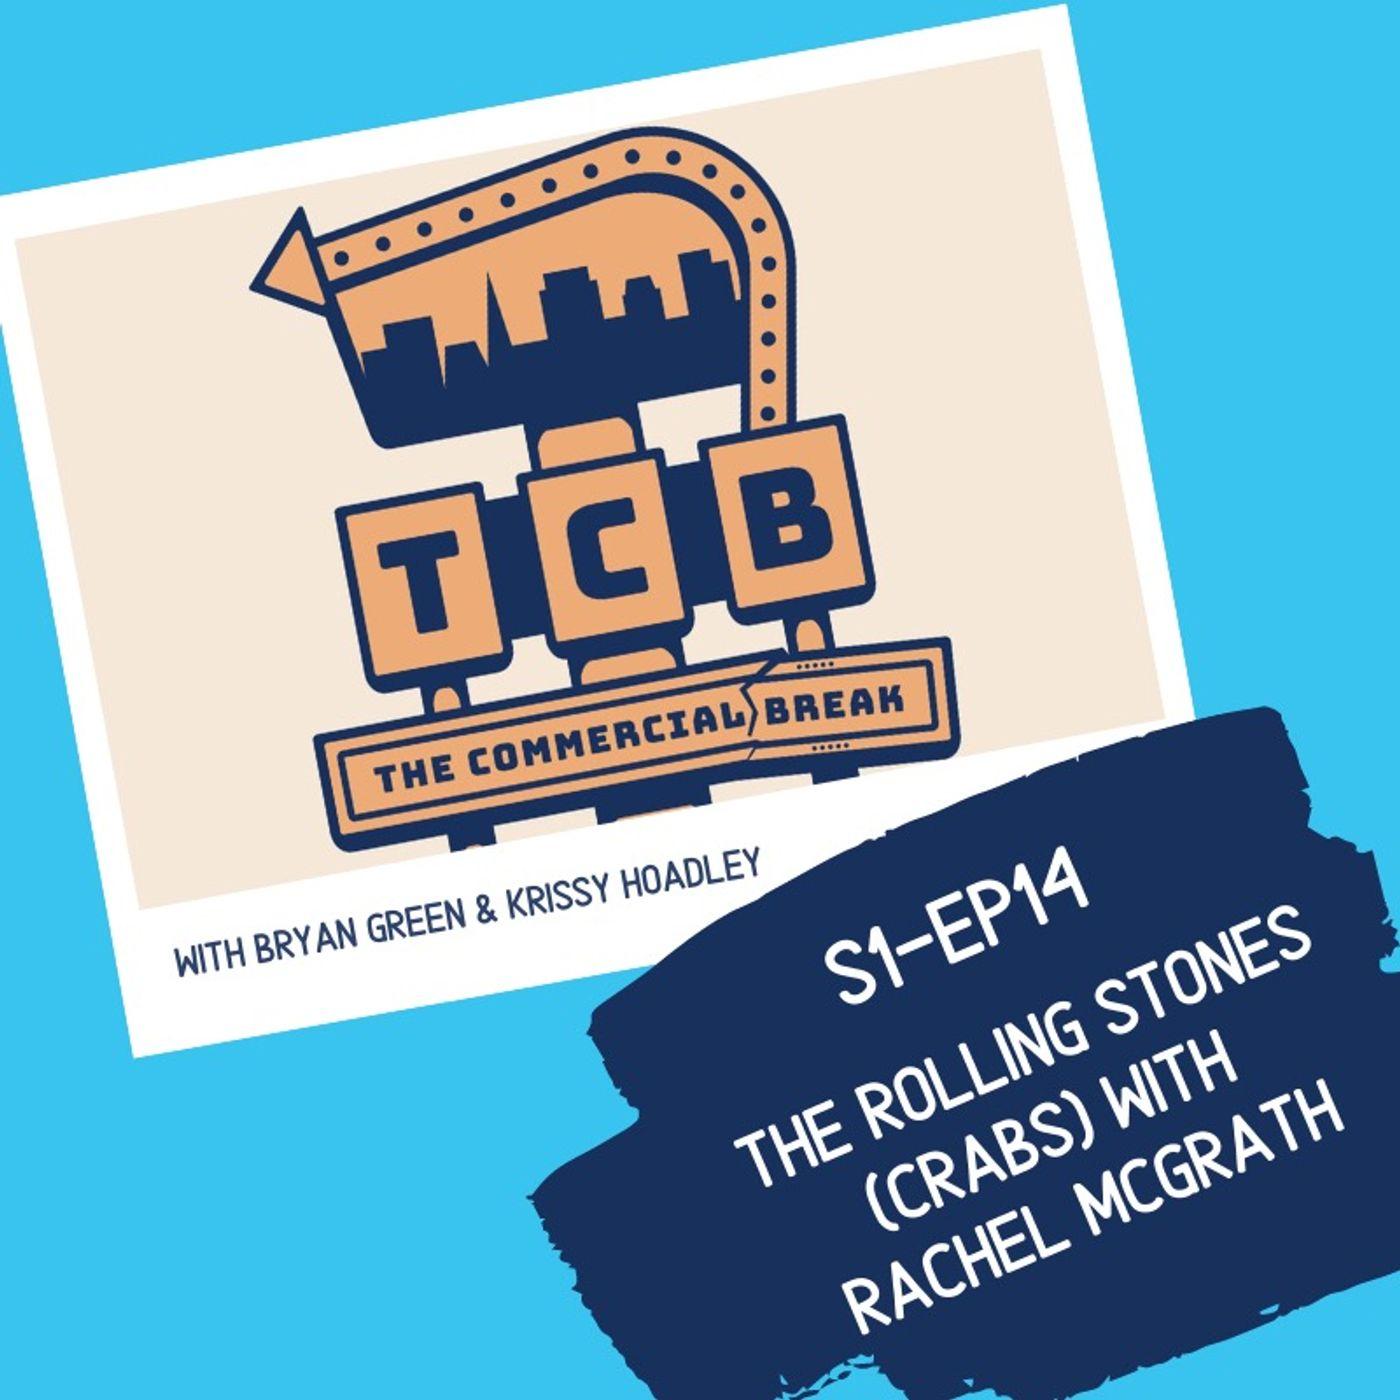 S1-EP14: The Rolling Stone (Crabs) With Rachel Mcgrath